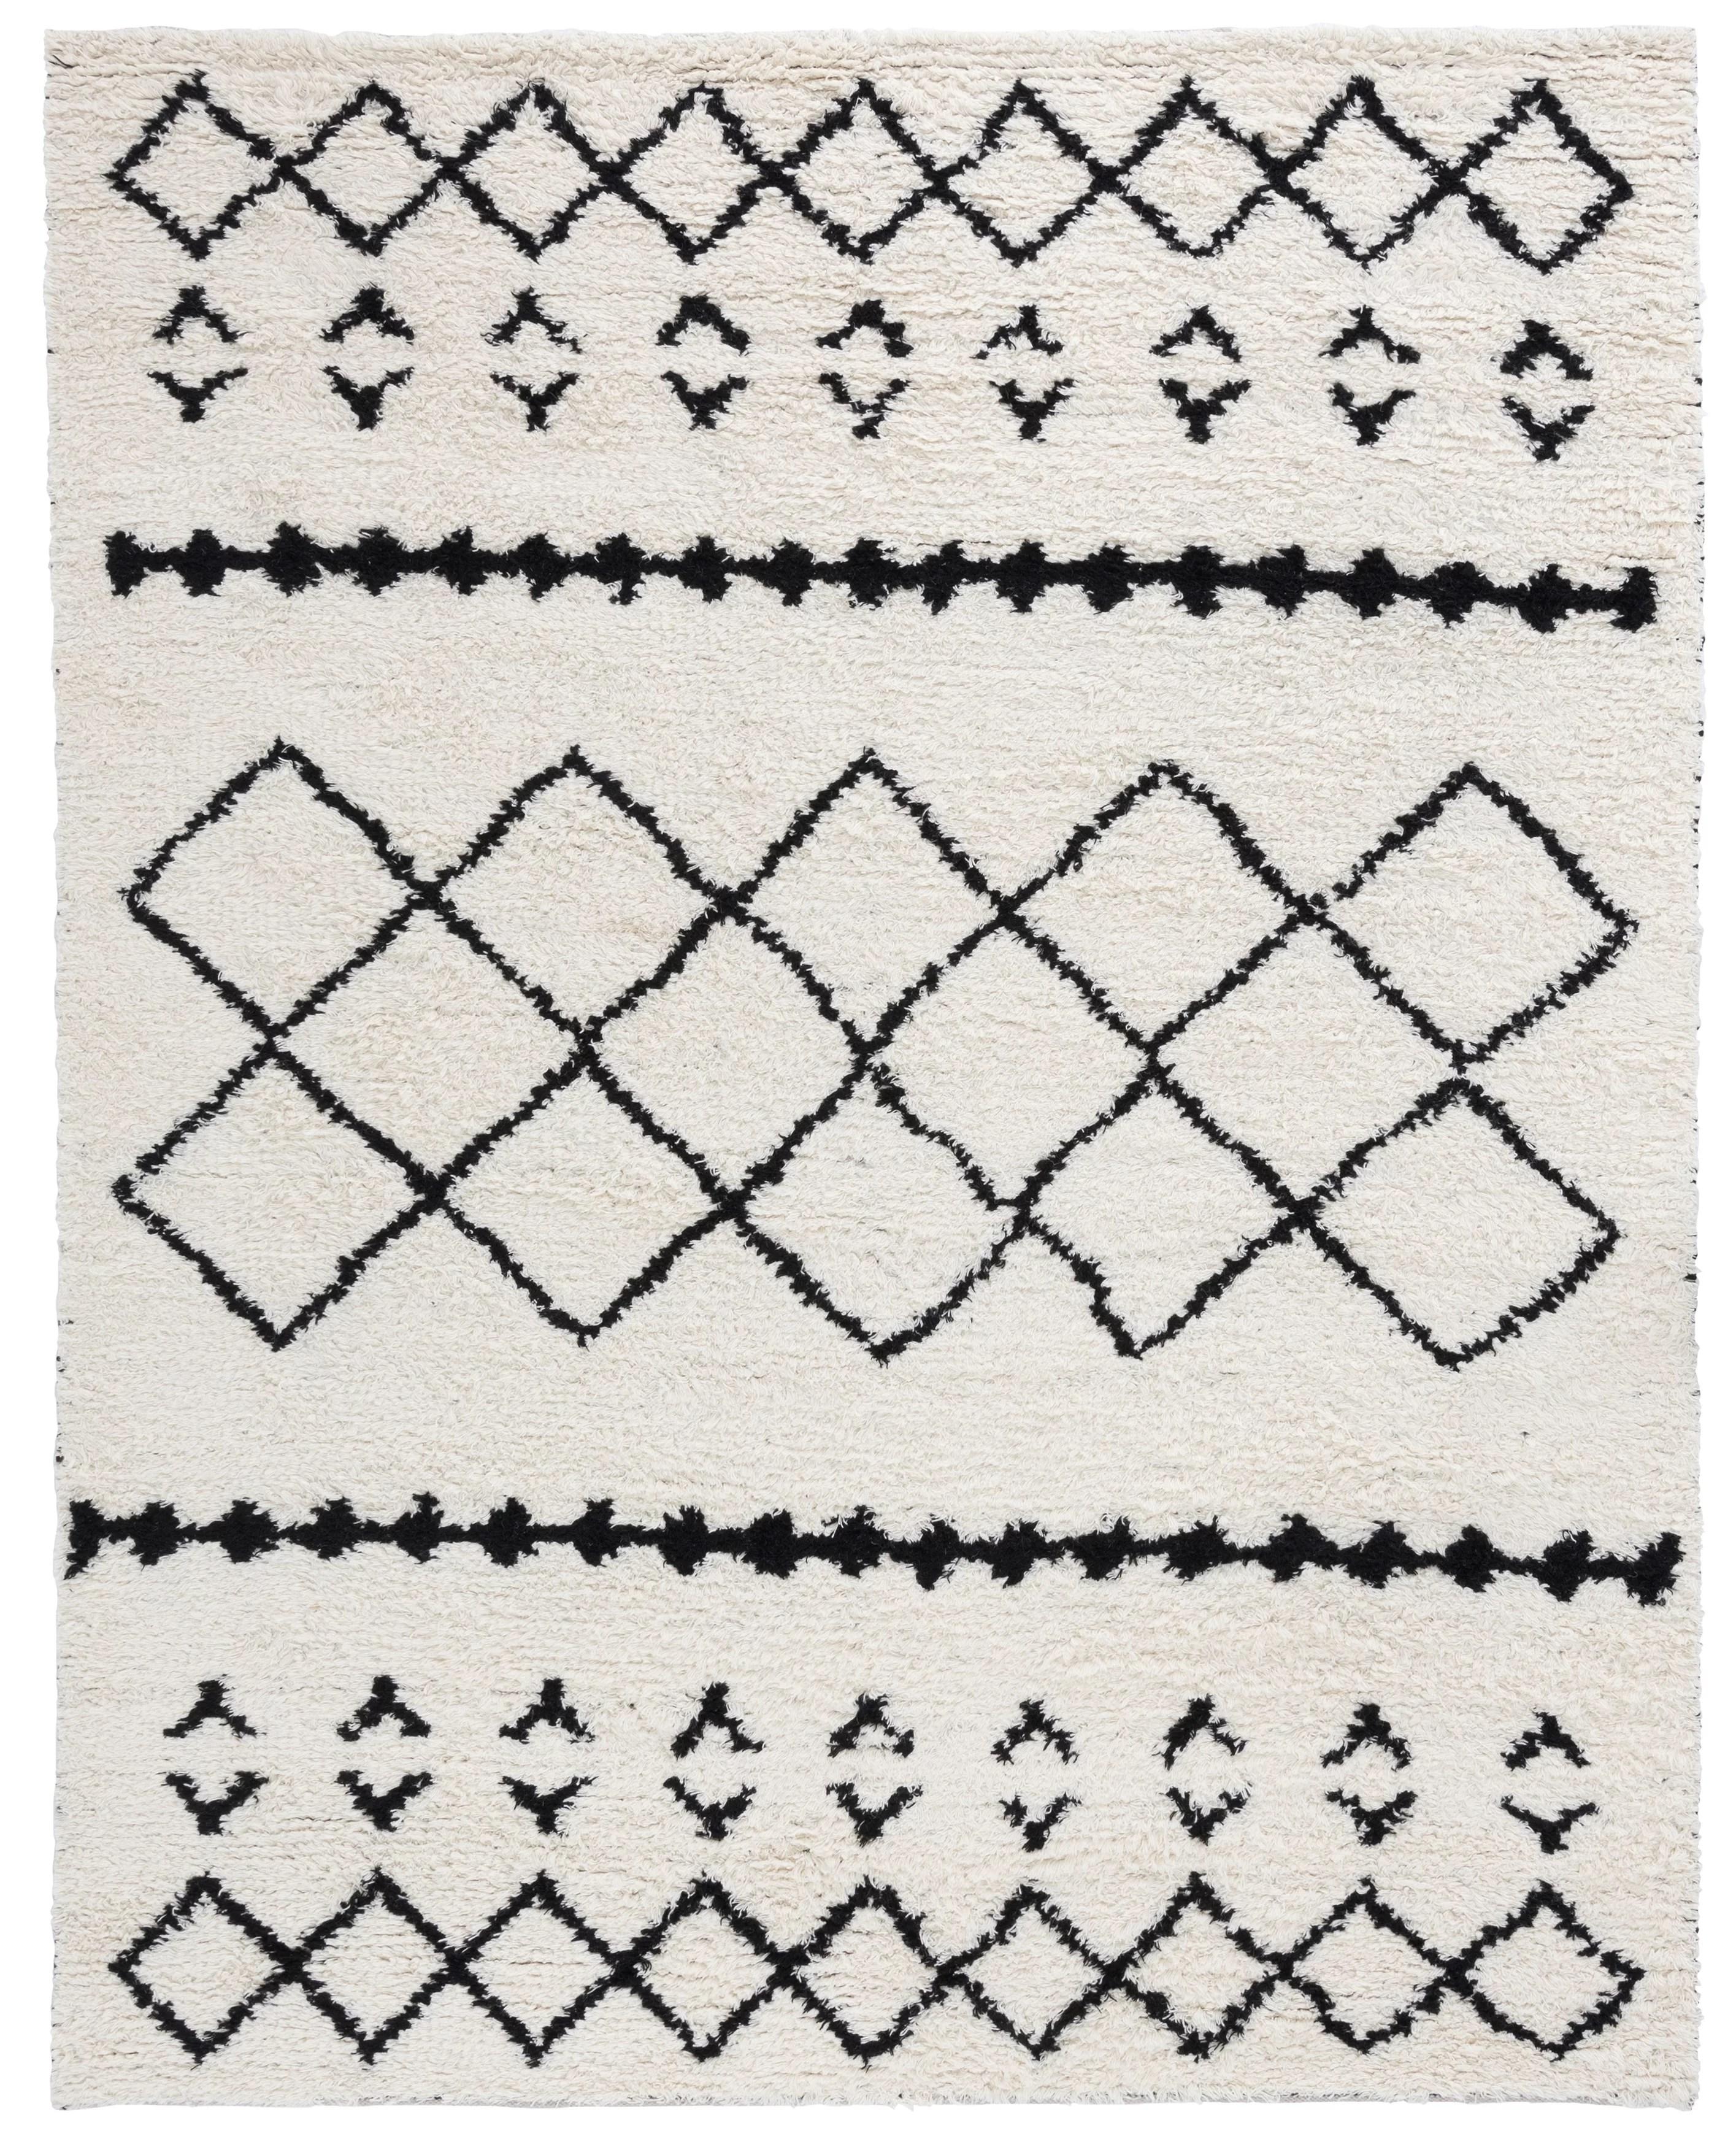 Union Rustic Turcotte Handmade Kilim Wool Cotton Ivory